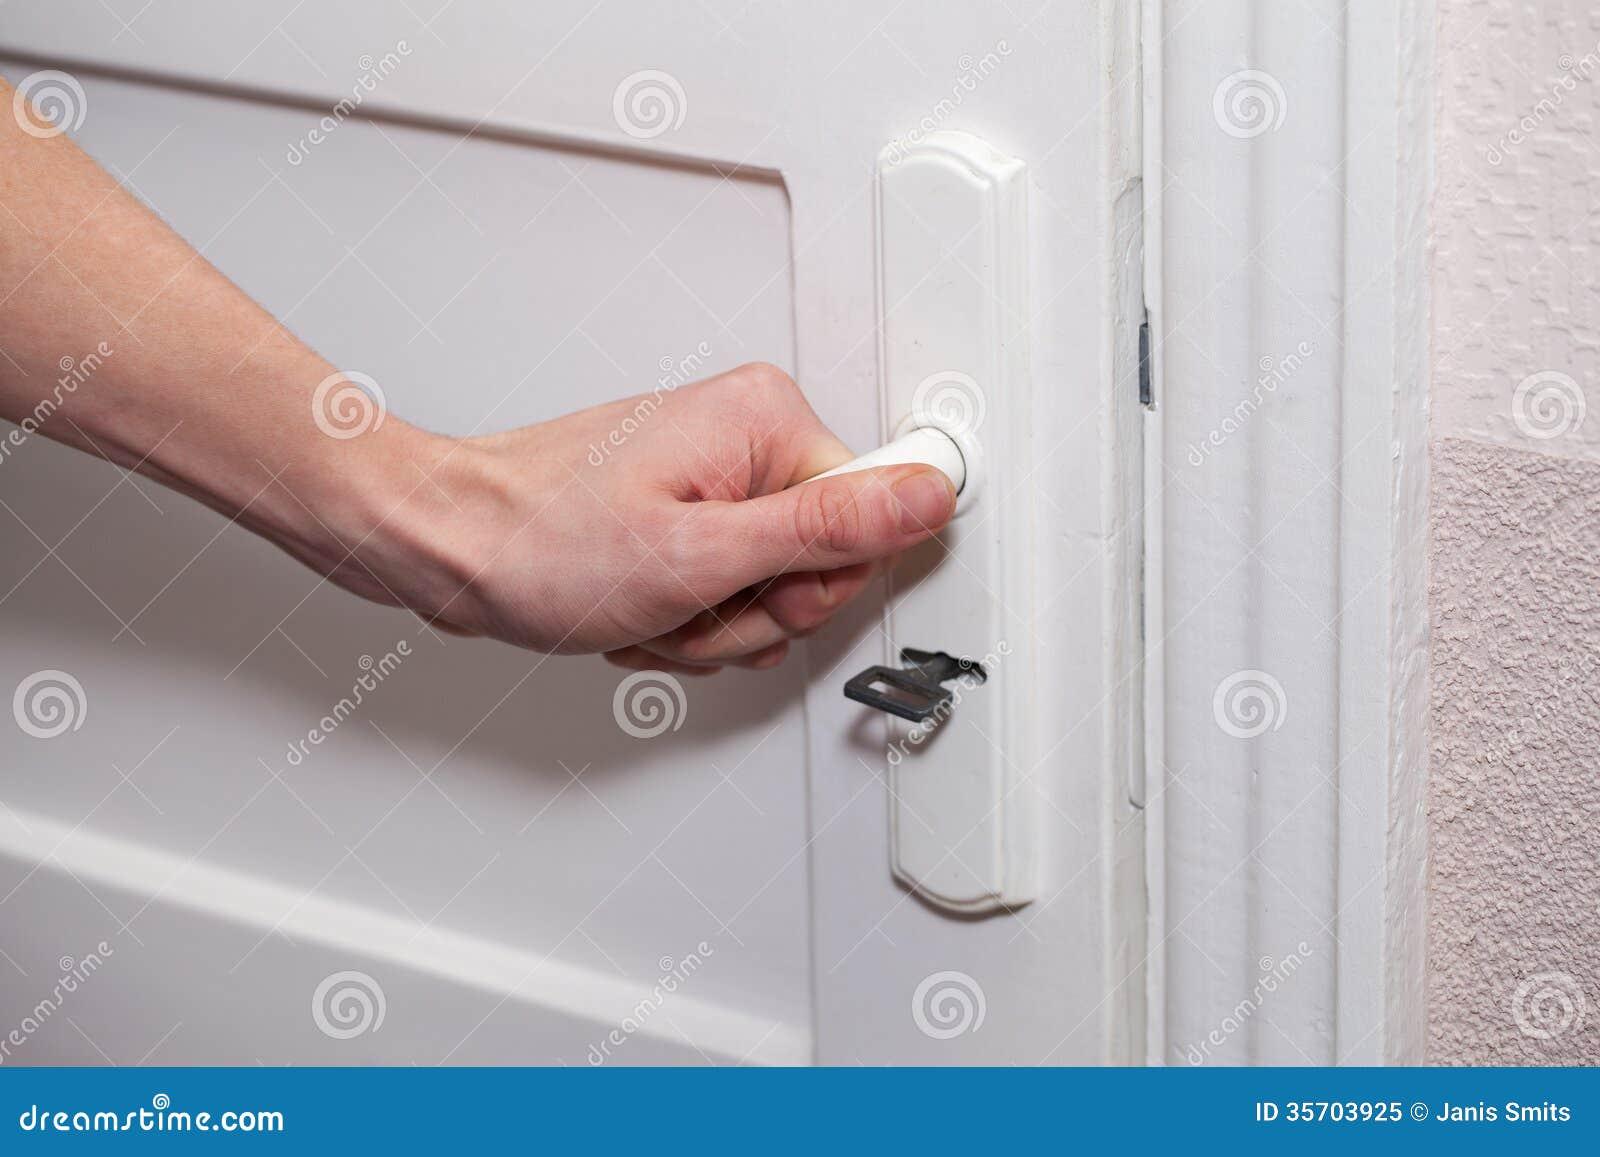 Hand and door. & Hand and door. stock image. Image of keyhole home lock - 35703925